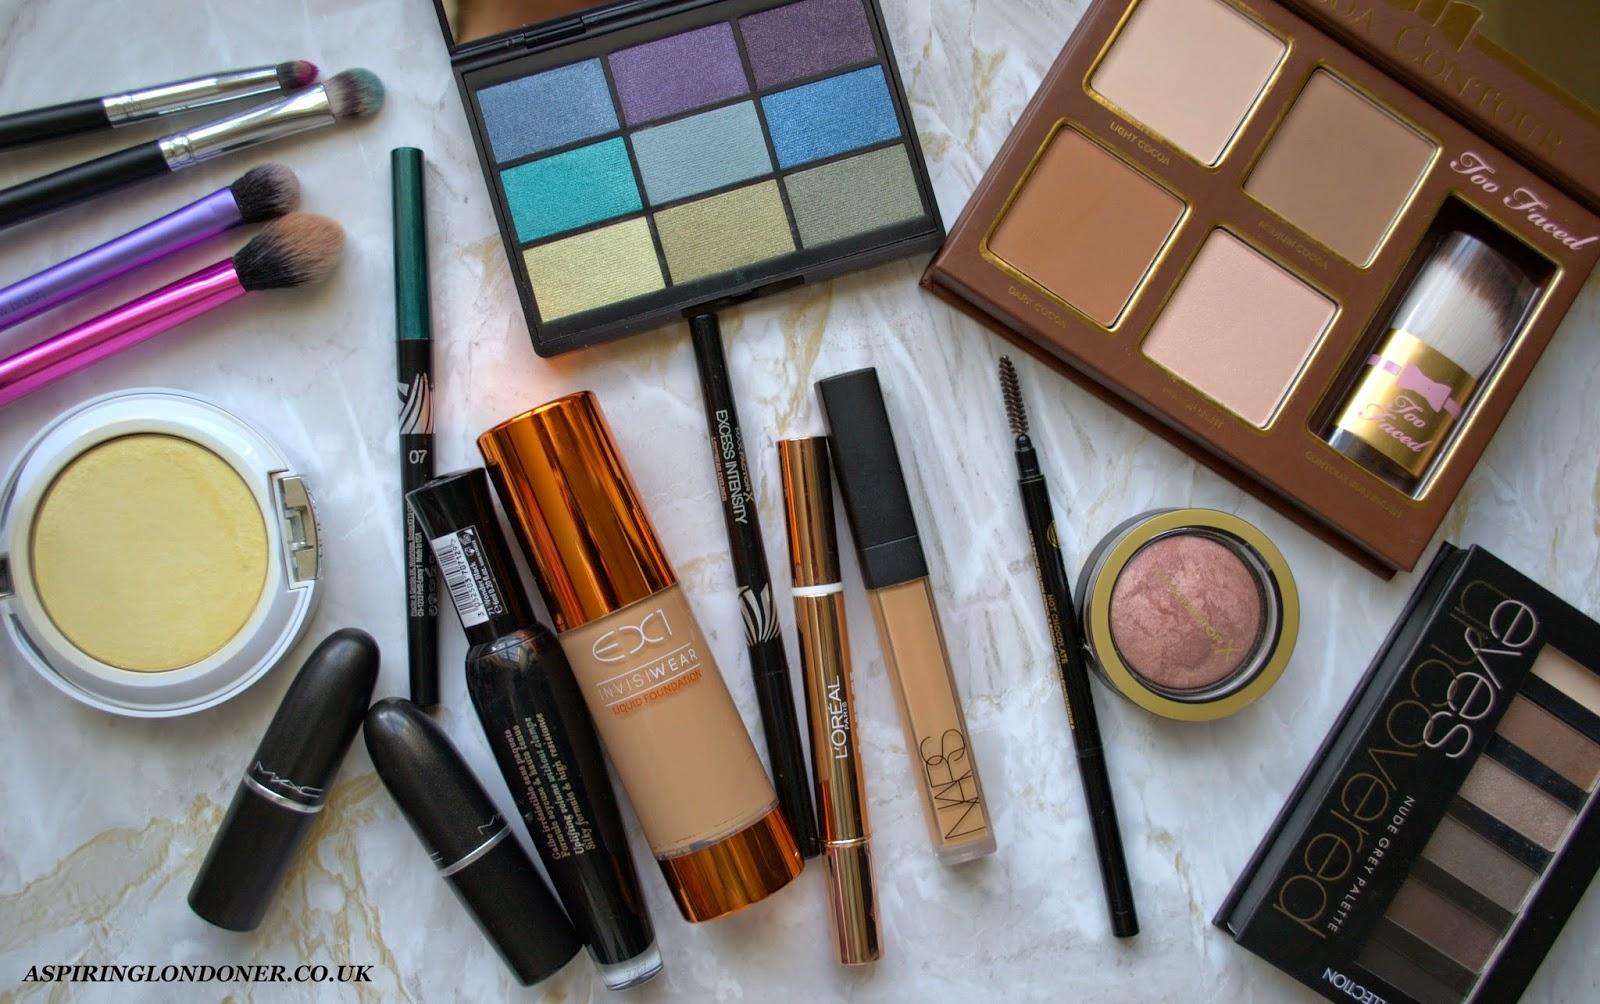 Get The Look Aishwarya Rai Bachchan Cannes 2015 Makeup - Aspiring Londoner